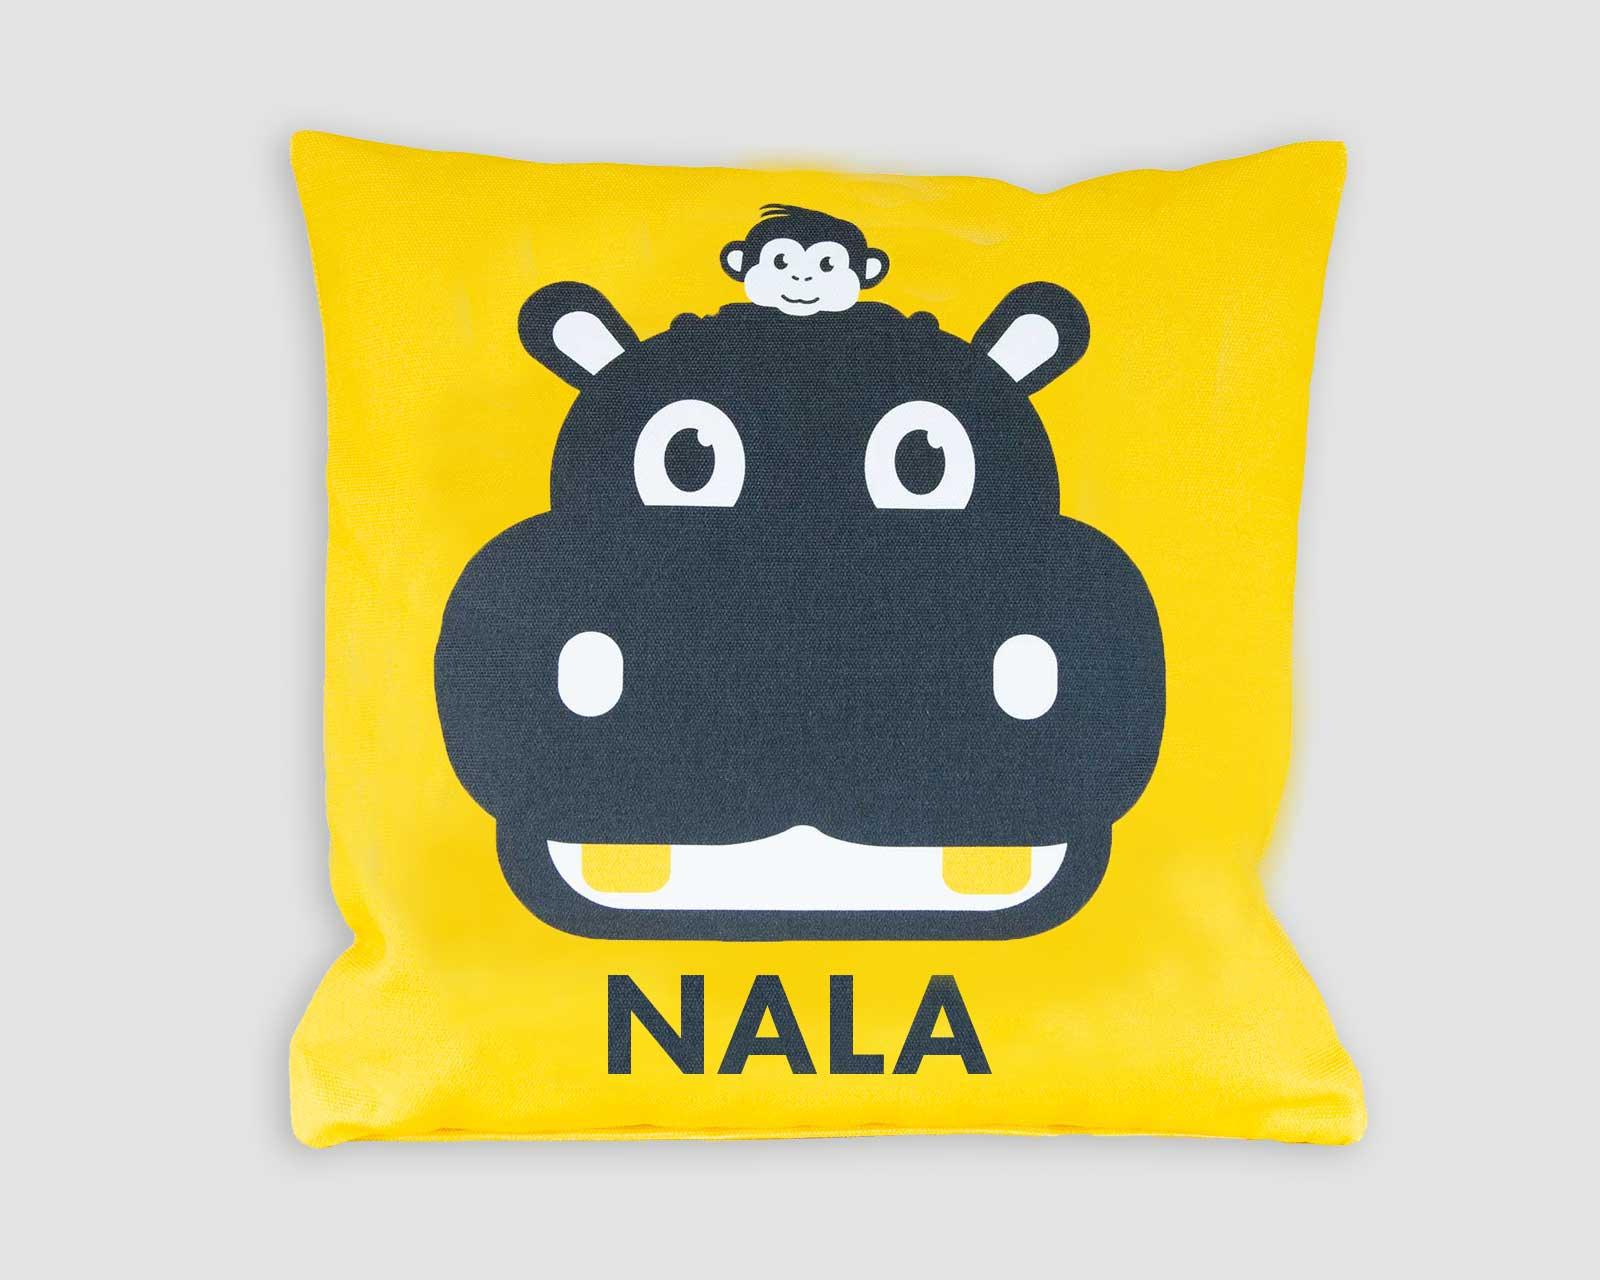 Kussenhoes gepersonaliseerd kraamcadeau met naam nijlpaard en aapje pie geel groen